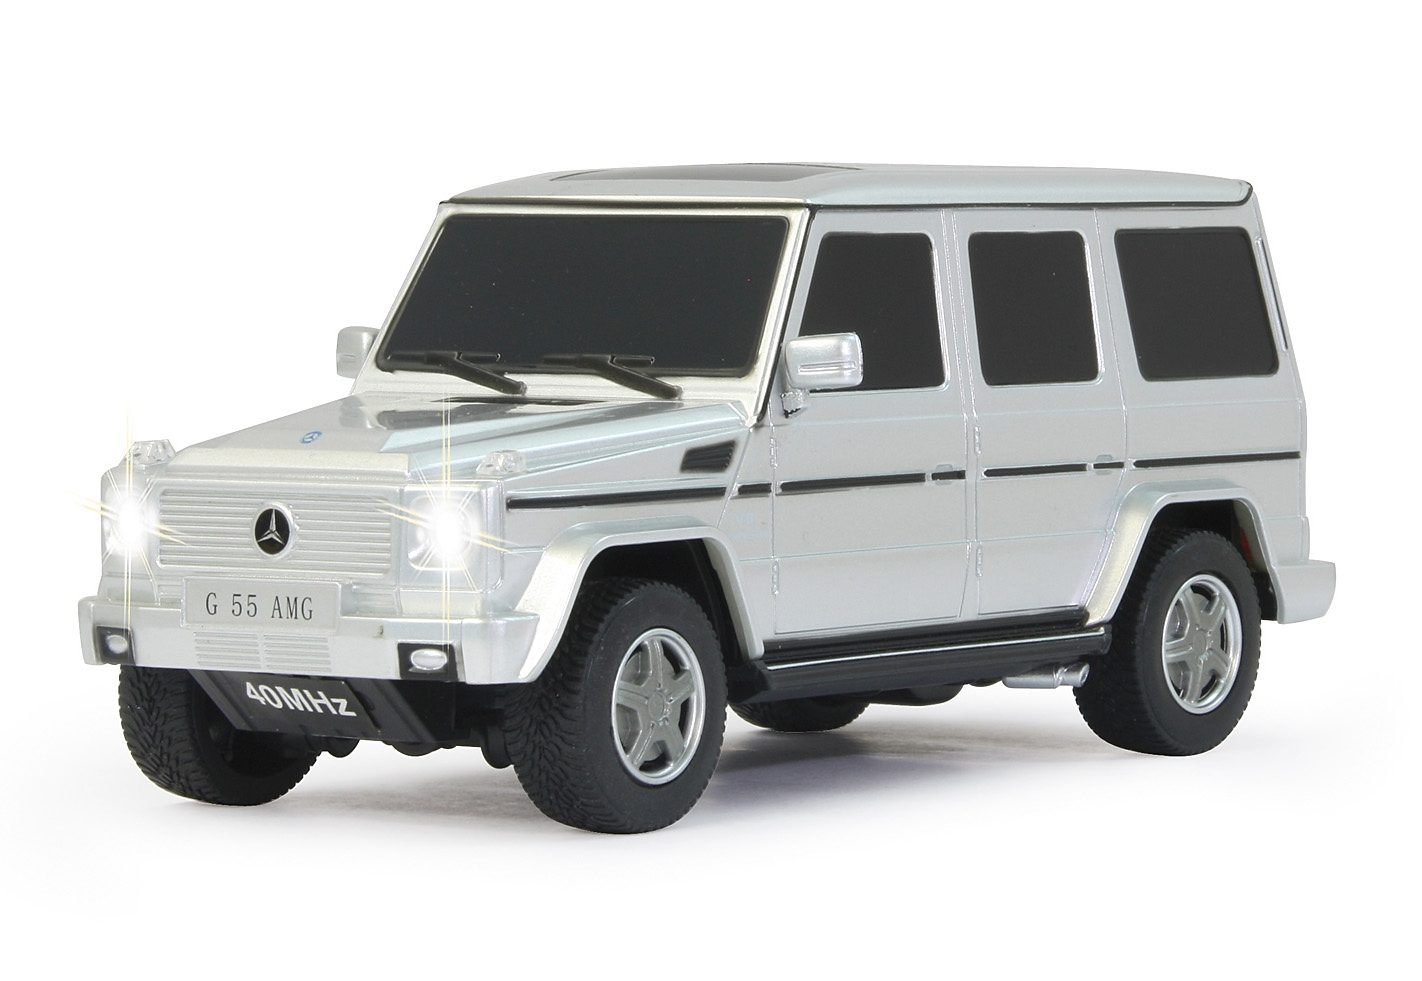 JAMARA RC Fahrzeug, »Mercedes G55 AMG - 40 MHz weiß«